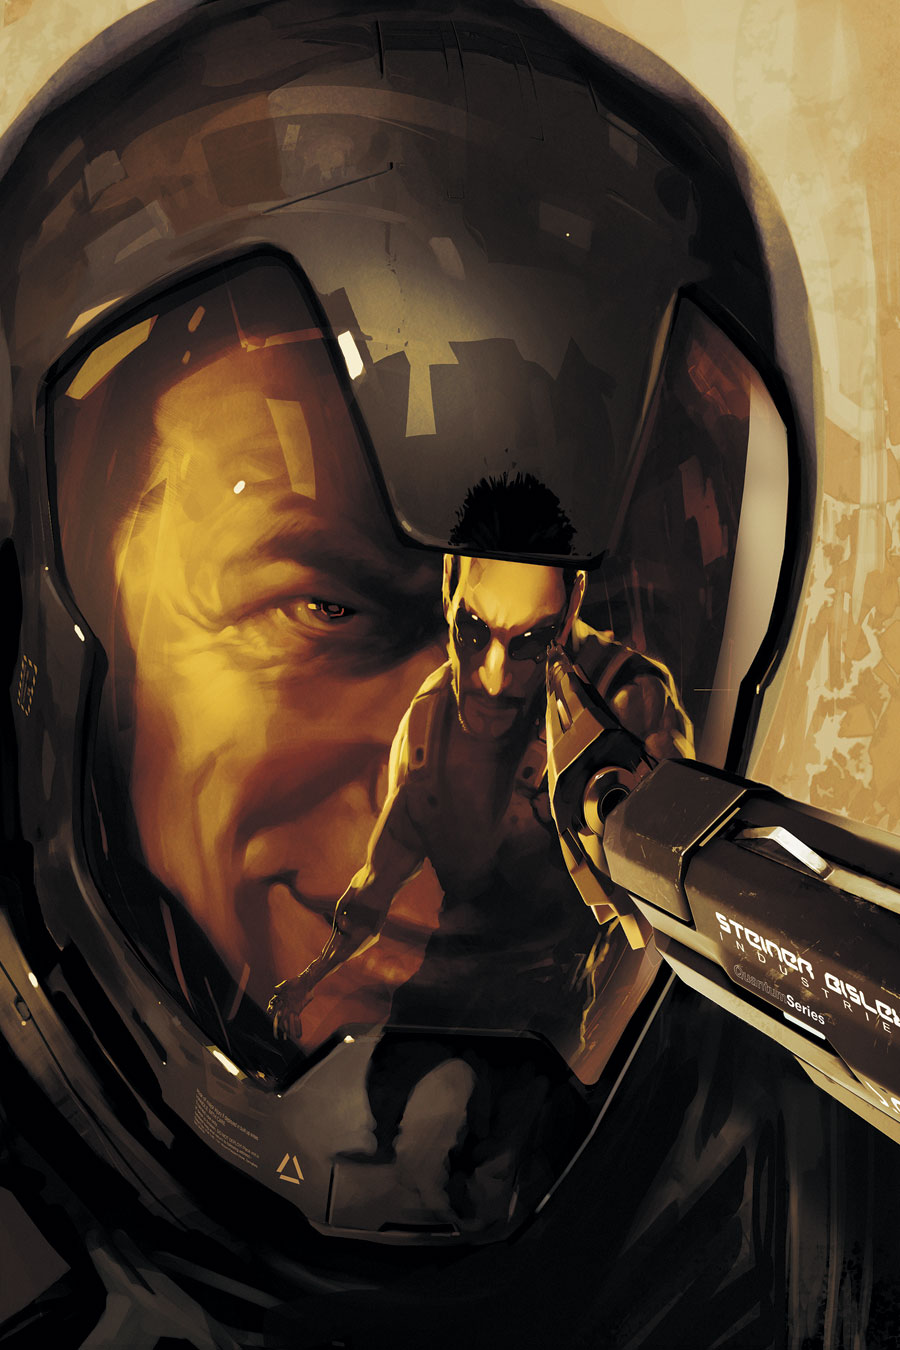 Deus Ex: Human Revolution - The Extinction Agenda!